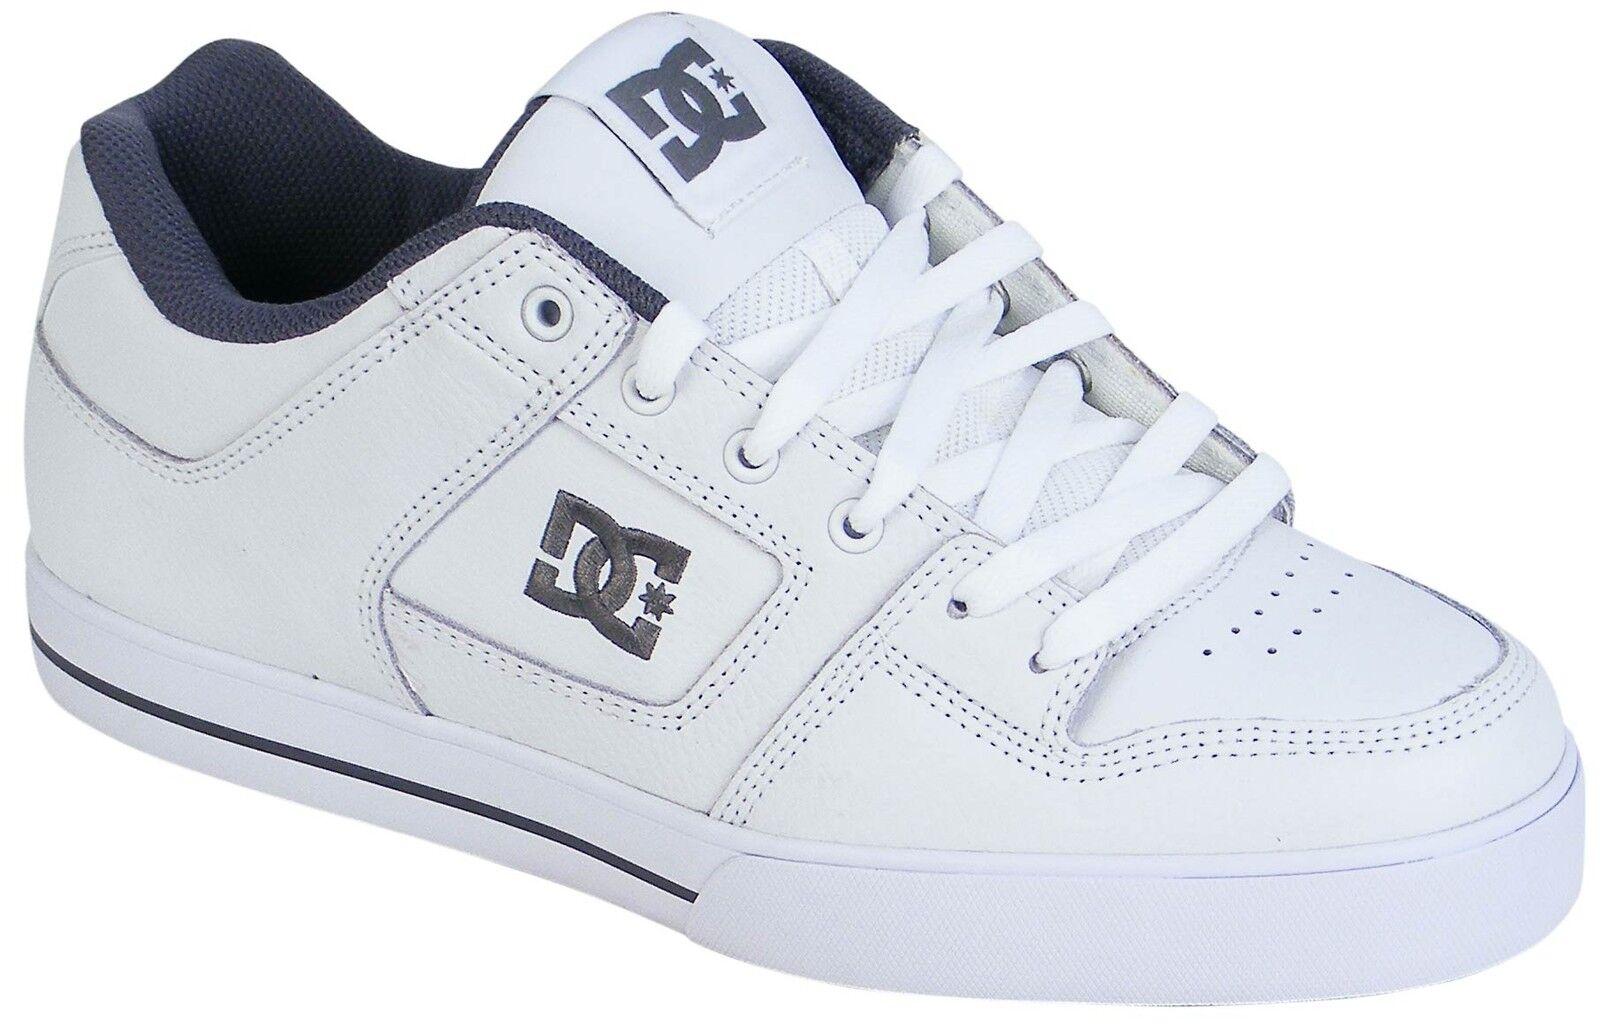 DC Pure Shoe - White / Battleship / White - New